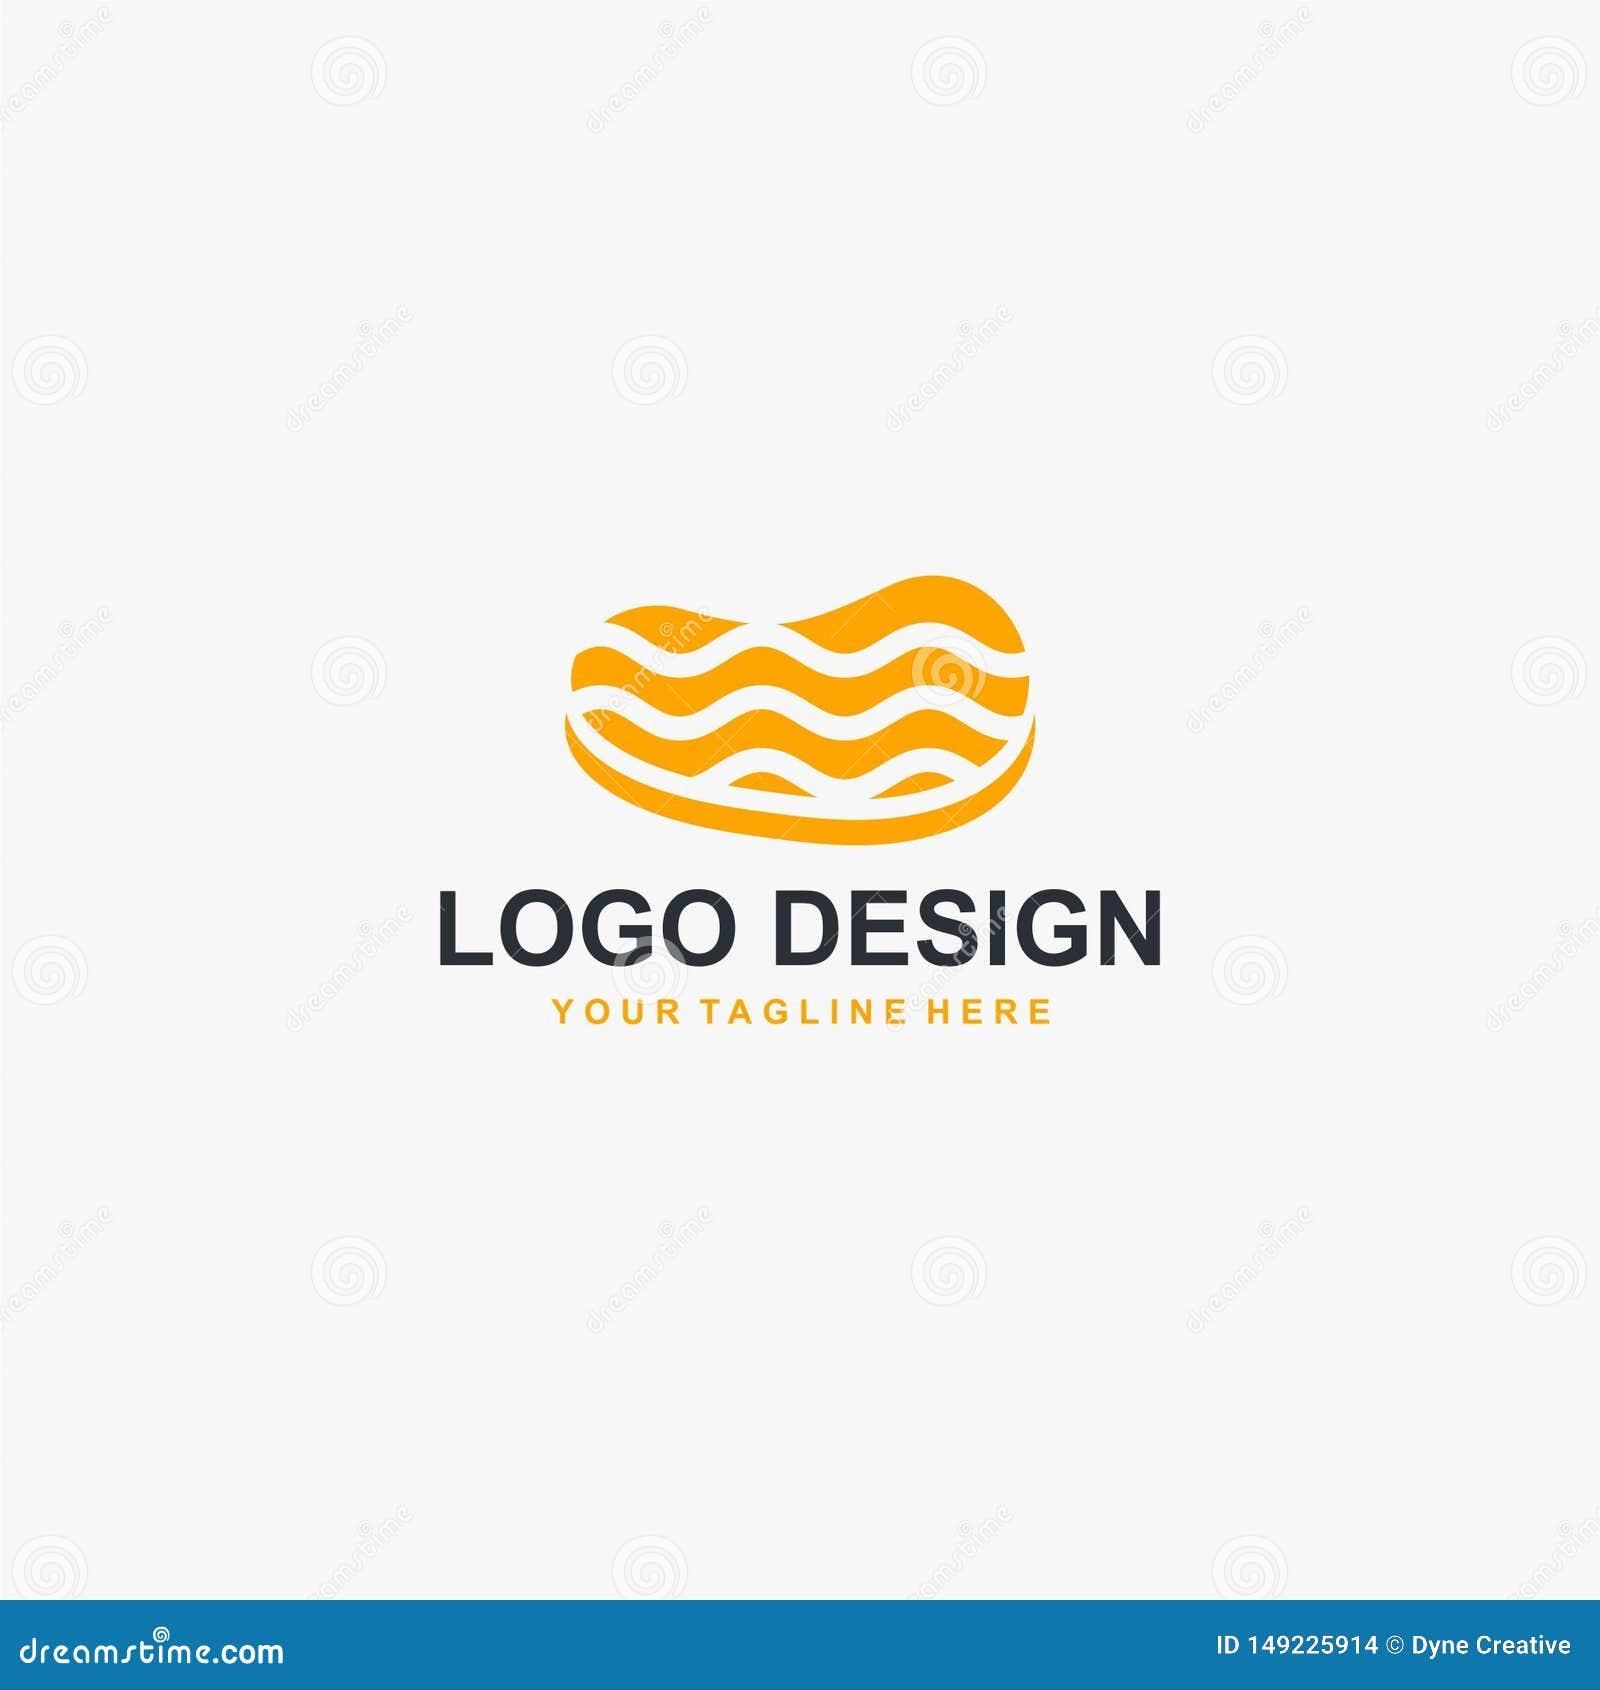 Vecteur de conception de logo de viande de bifteck Conception de logo de nourriture pour la restauration